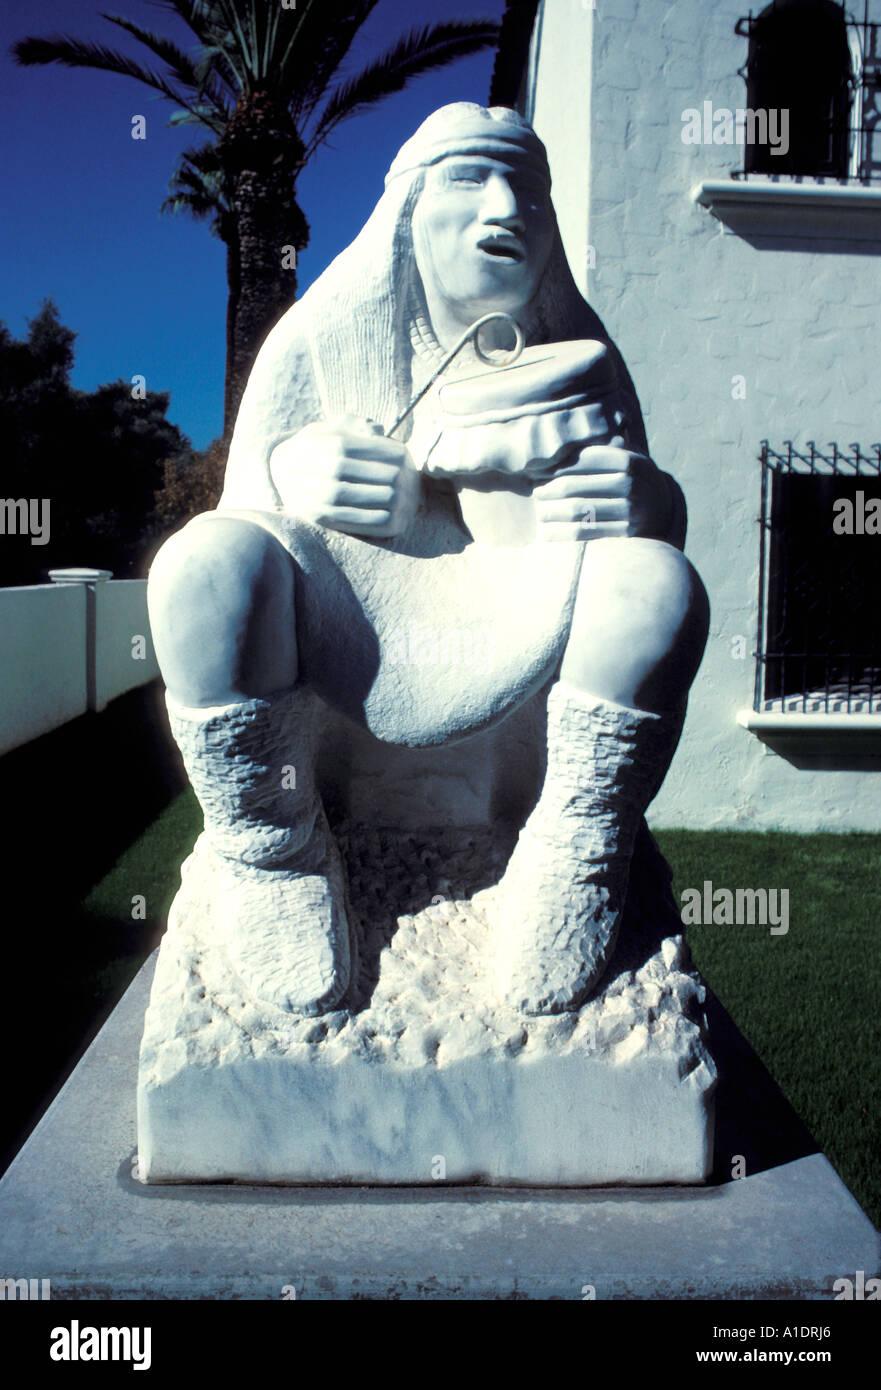 Arizona Phoenix Alan Houser sculpture at Heard Museum - Stock Image